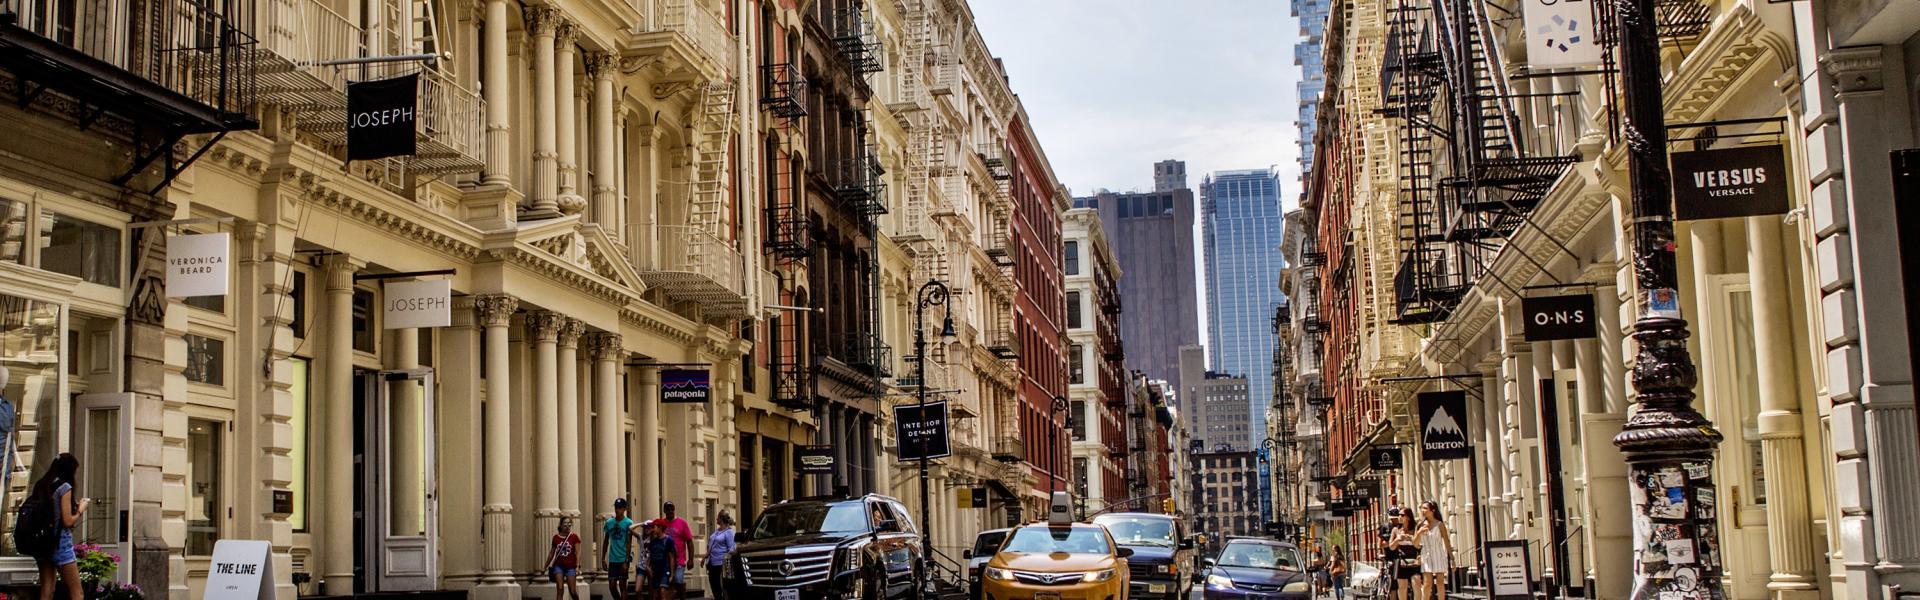 Soho, Street View, Taxi